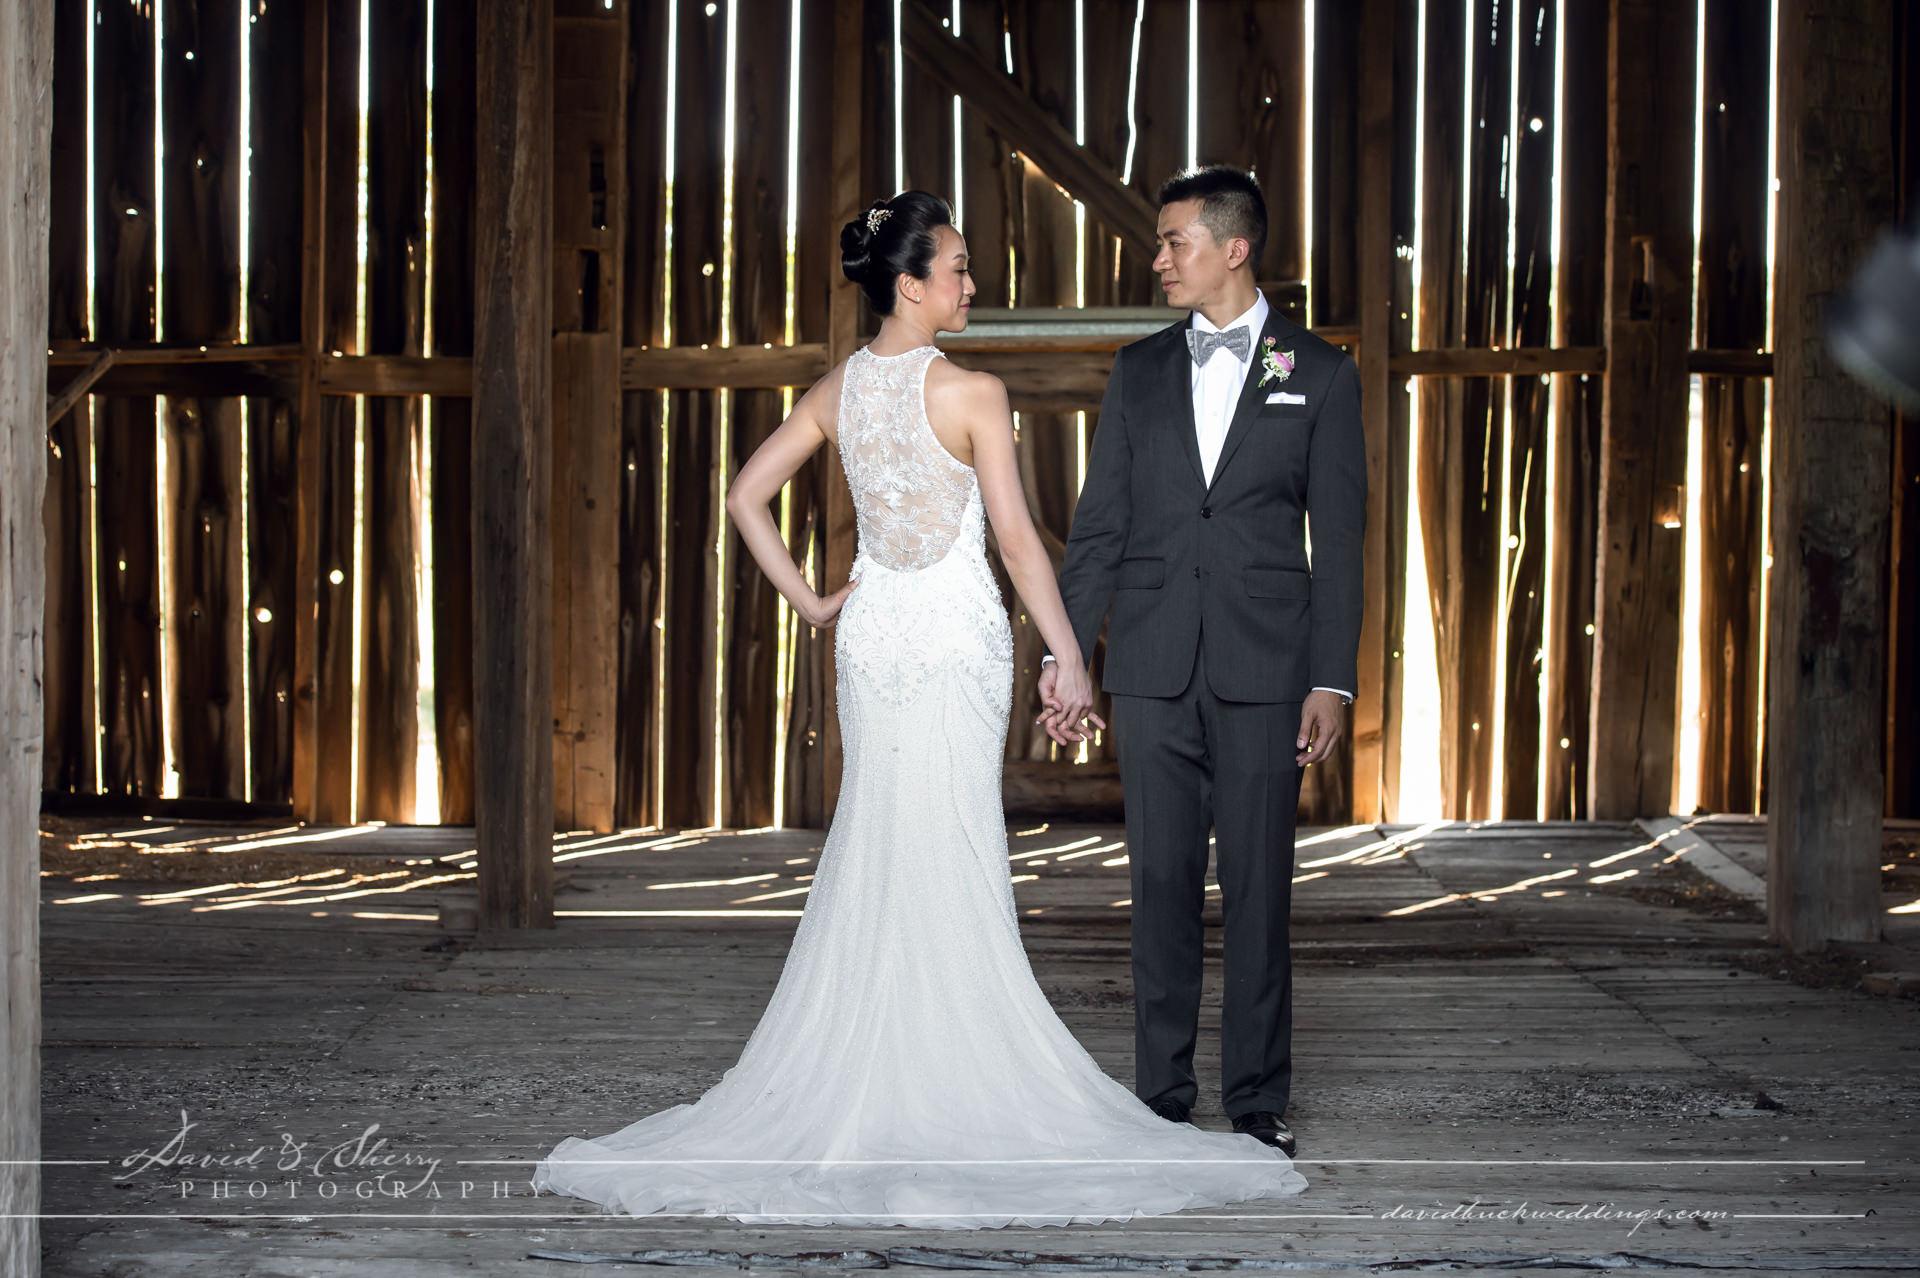 waterstone-estate-wedding-david-sherry-photography-simon-crystal-016